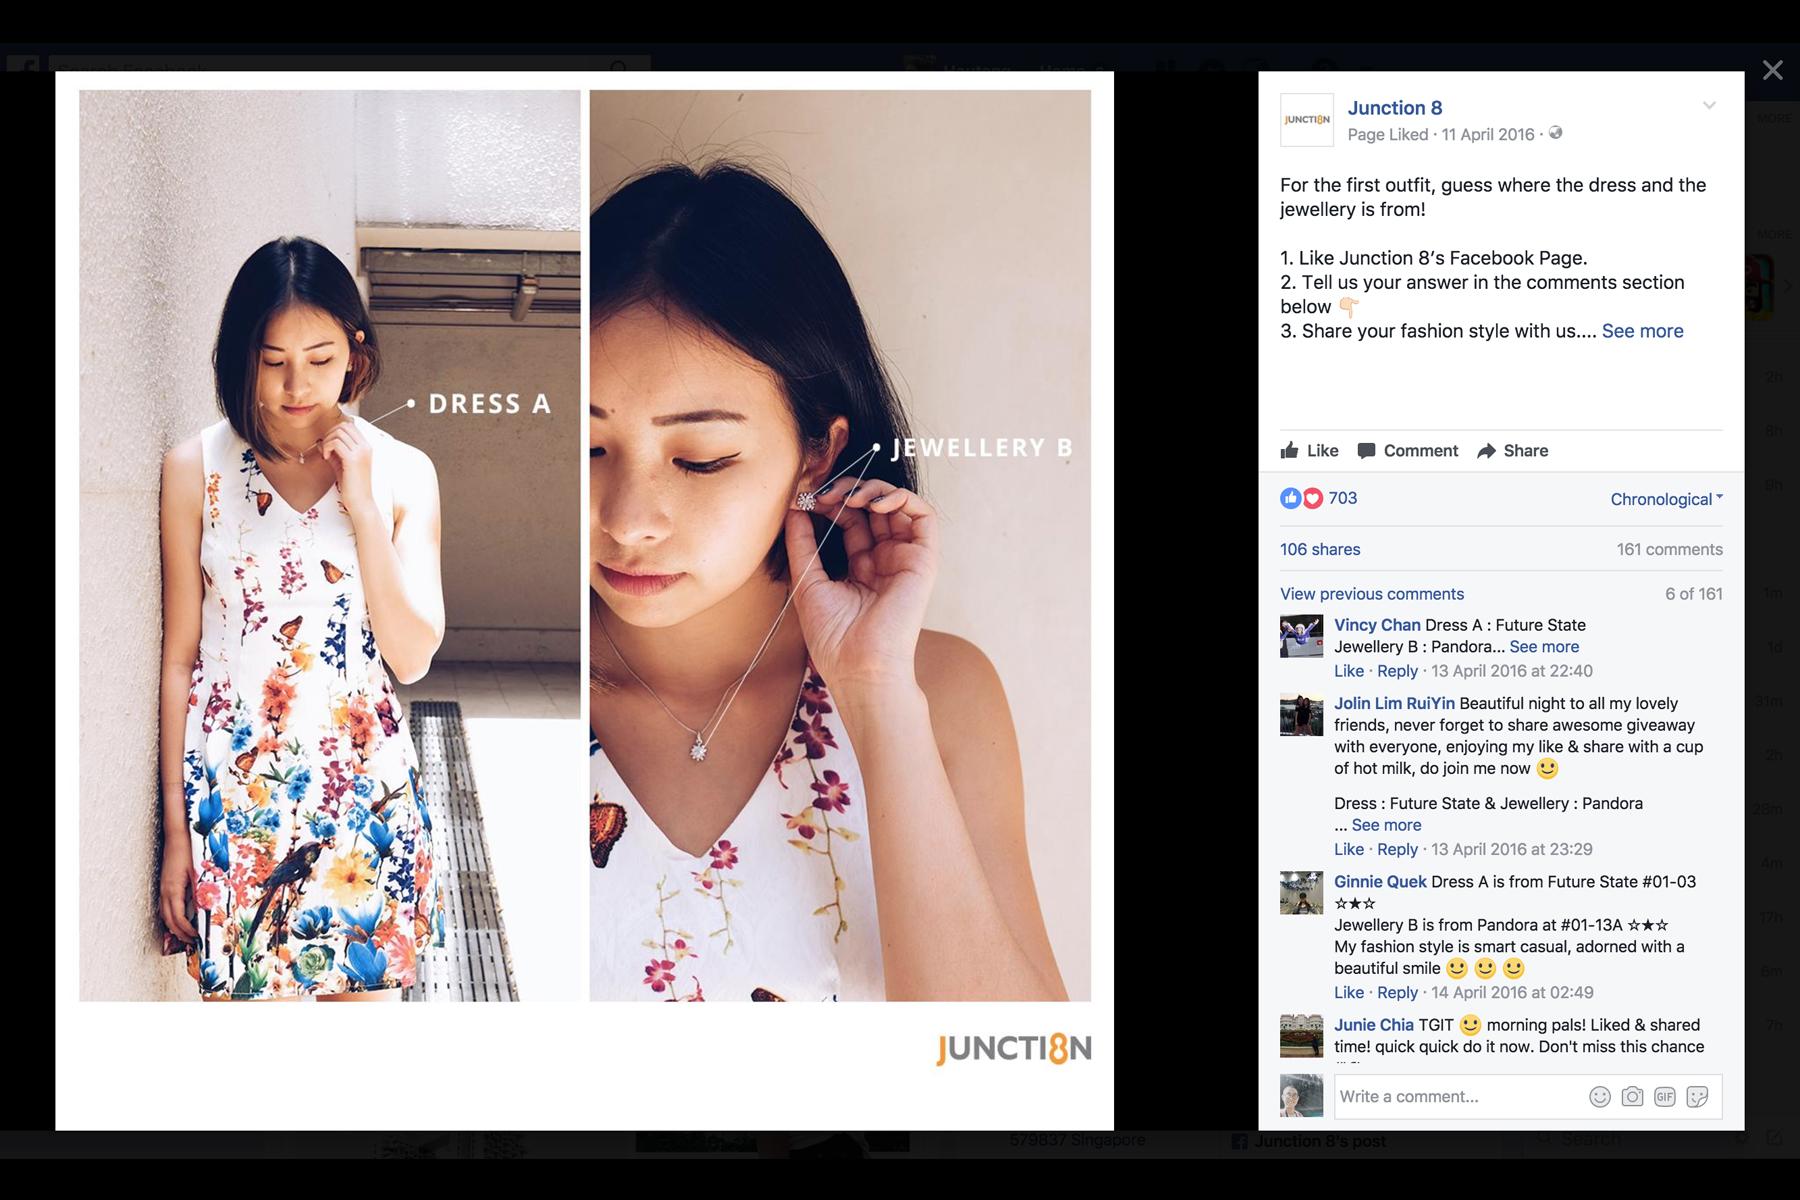 Design and Digital Marketing - Junction 8 Fashion Week 2016 - Facebook Post 1 - Leow Hou Teng